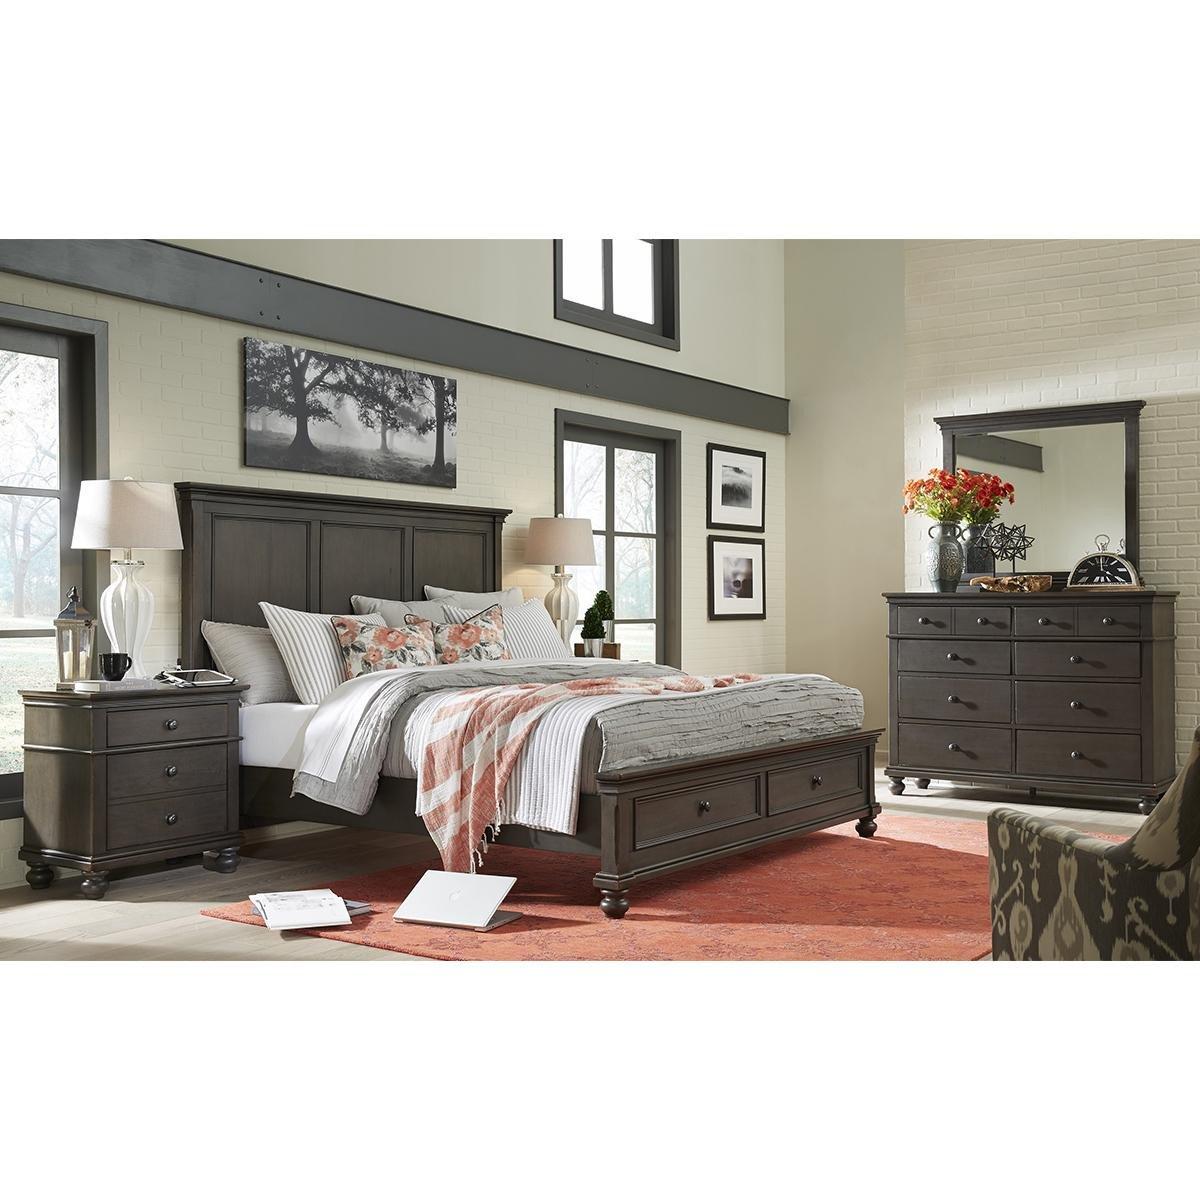 Small Storage Bench for Bedroom Inspirational Riva Ridge Oxford 4 Piece Queen Bedroom Set In Peppercorn